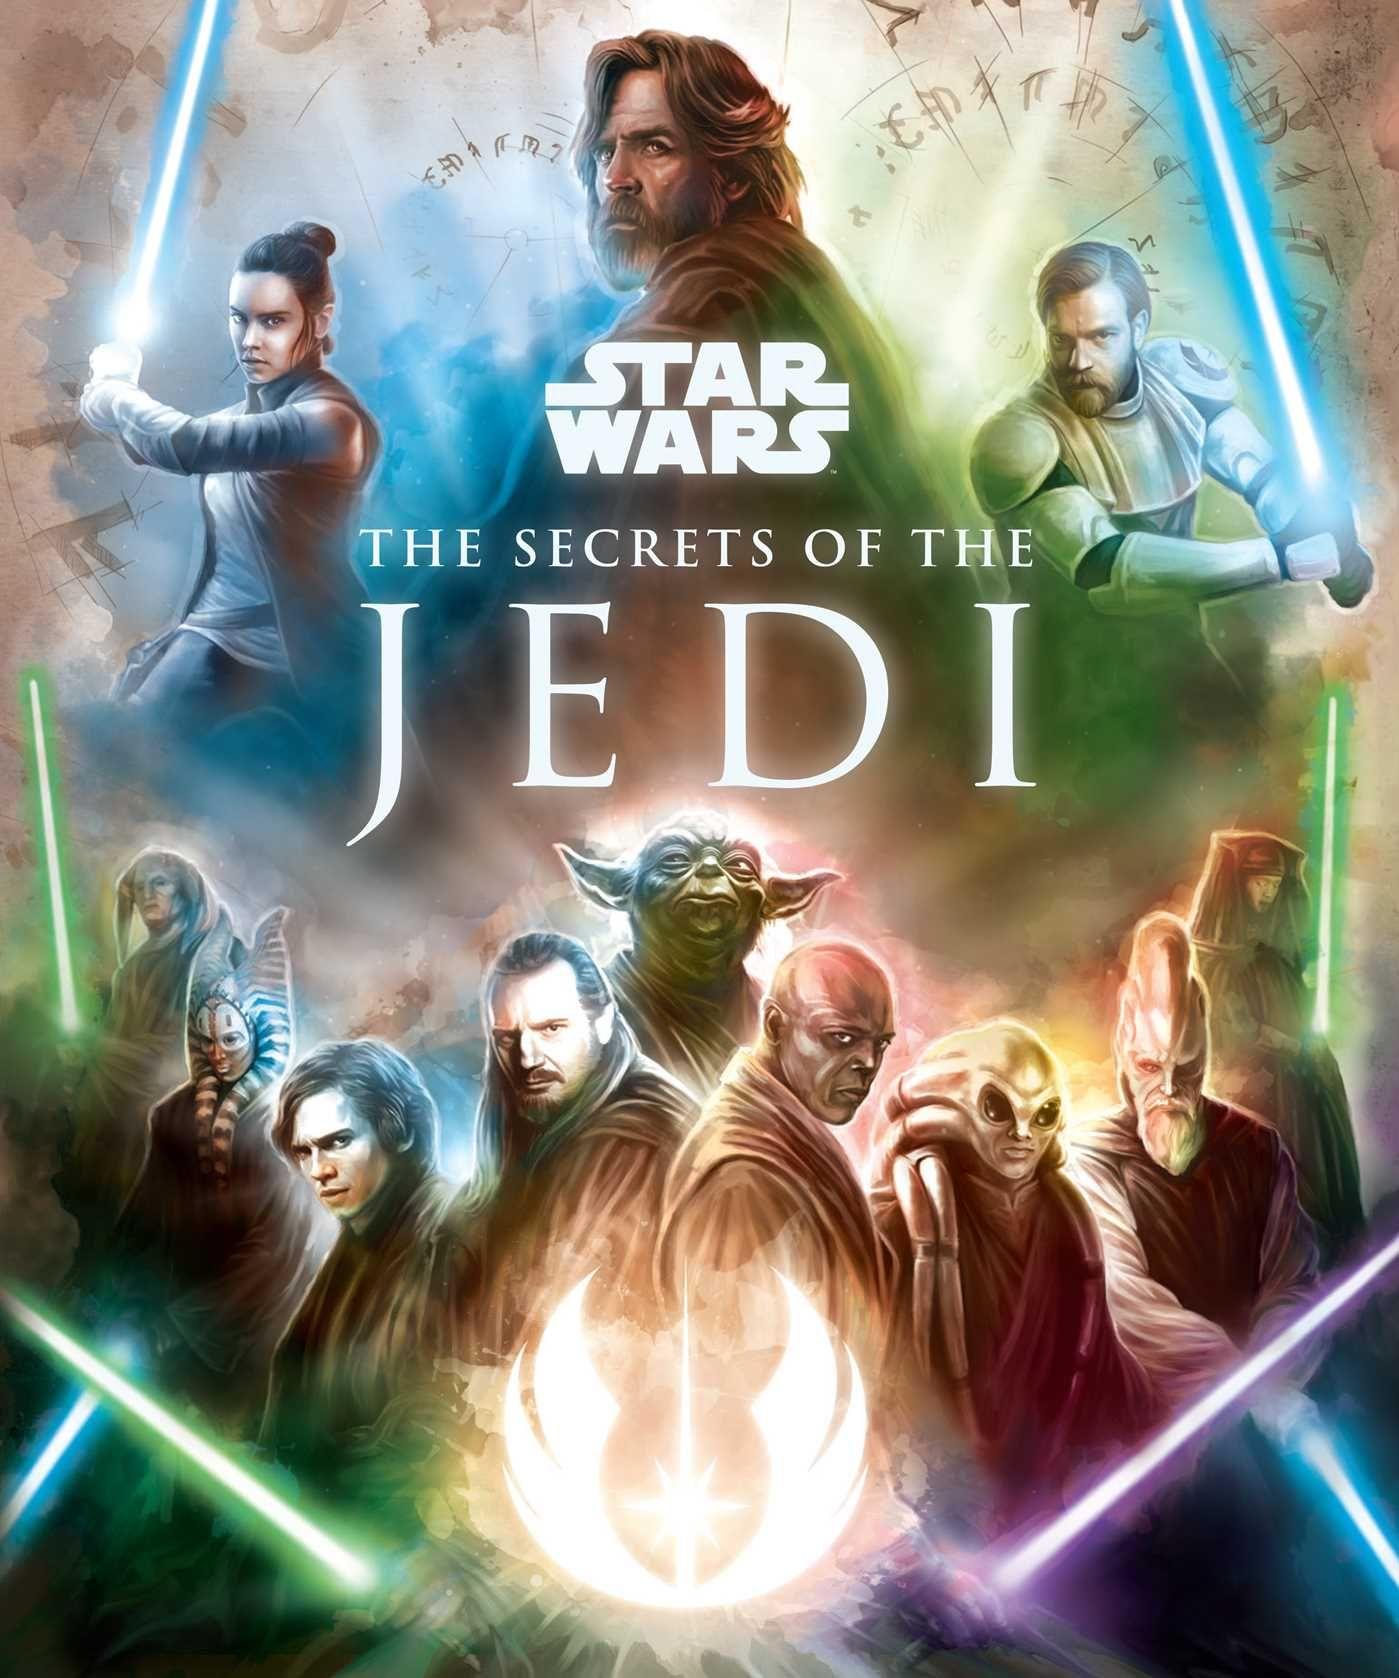 Pdf Download Star Wars The Secrets Of The Jedi Star Wars Books Star Wars New Star Wars